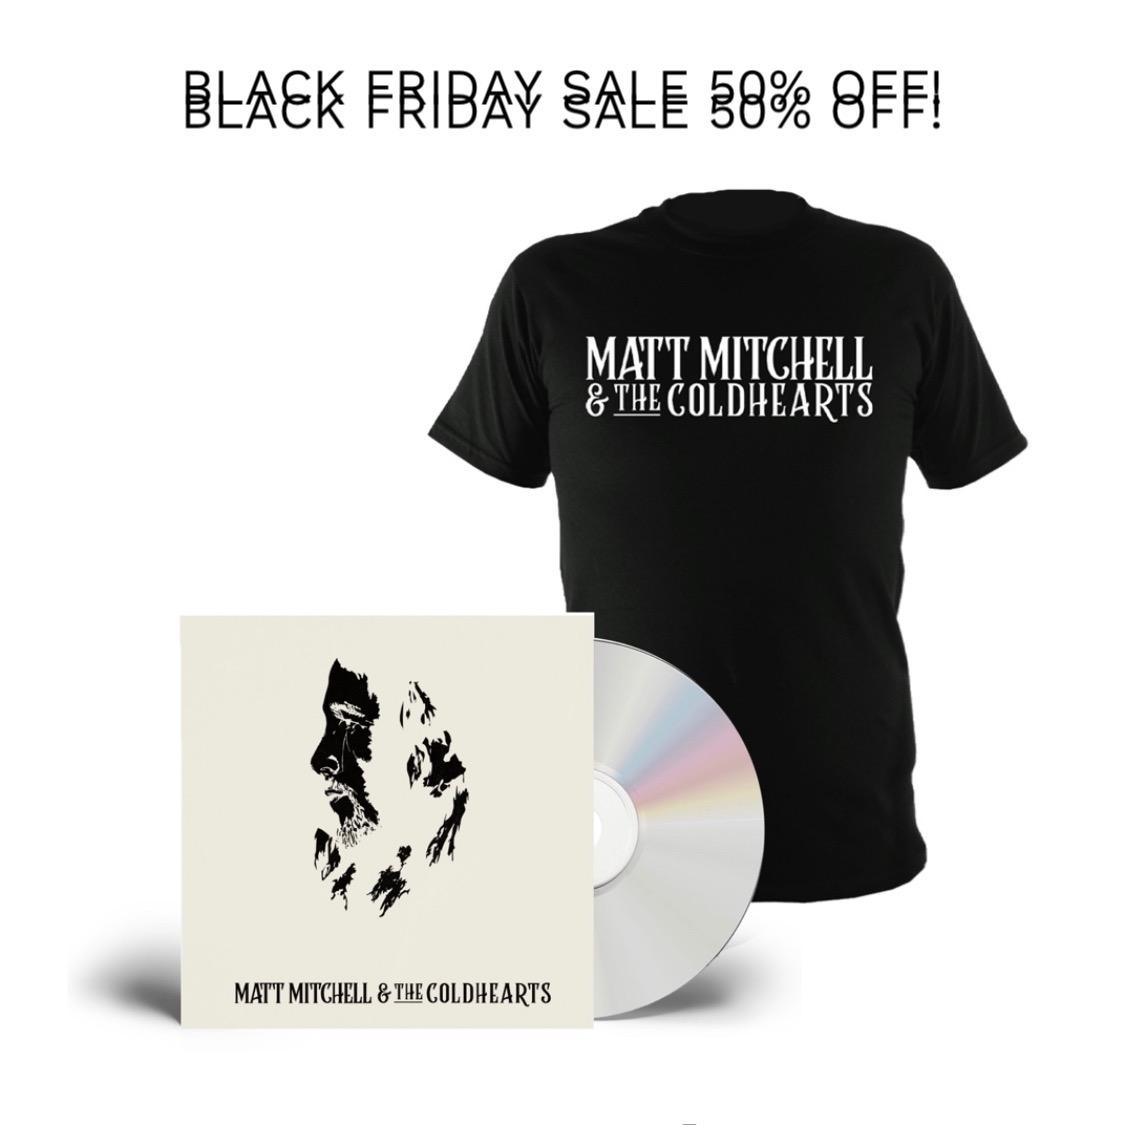 Buy Online Matt Mitchell & The Coldhearts - Matt Mitchell & The Coldhearts (Signed) + Matt Mitchell and the Coldhearts T-Shirt (Inc. Coaster)